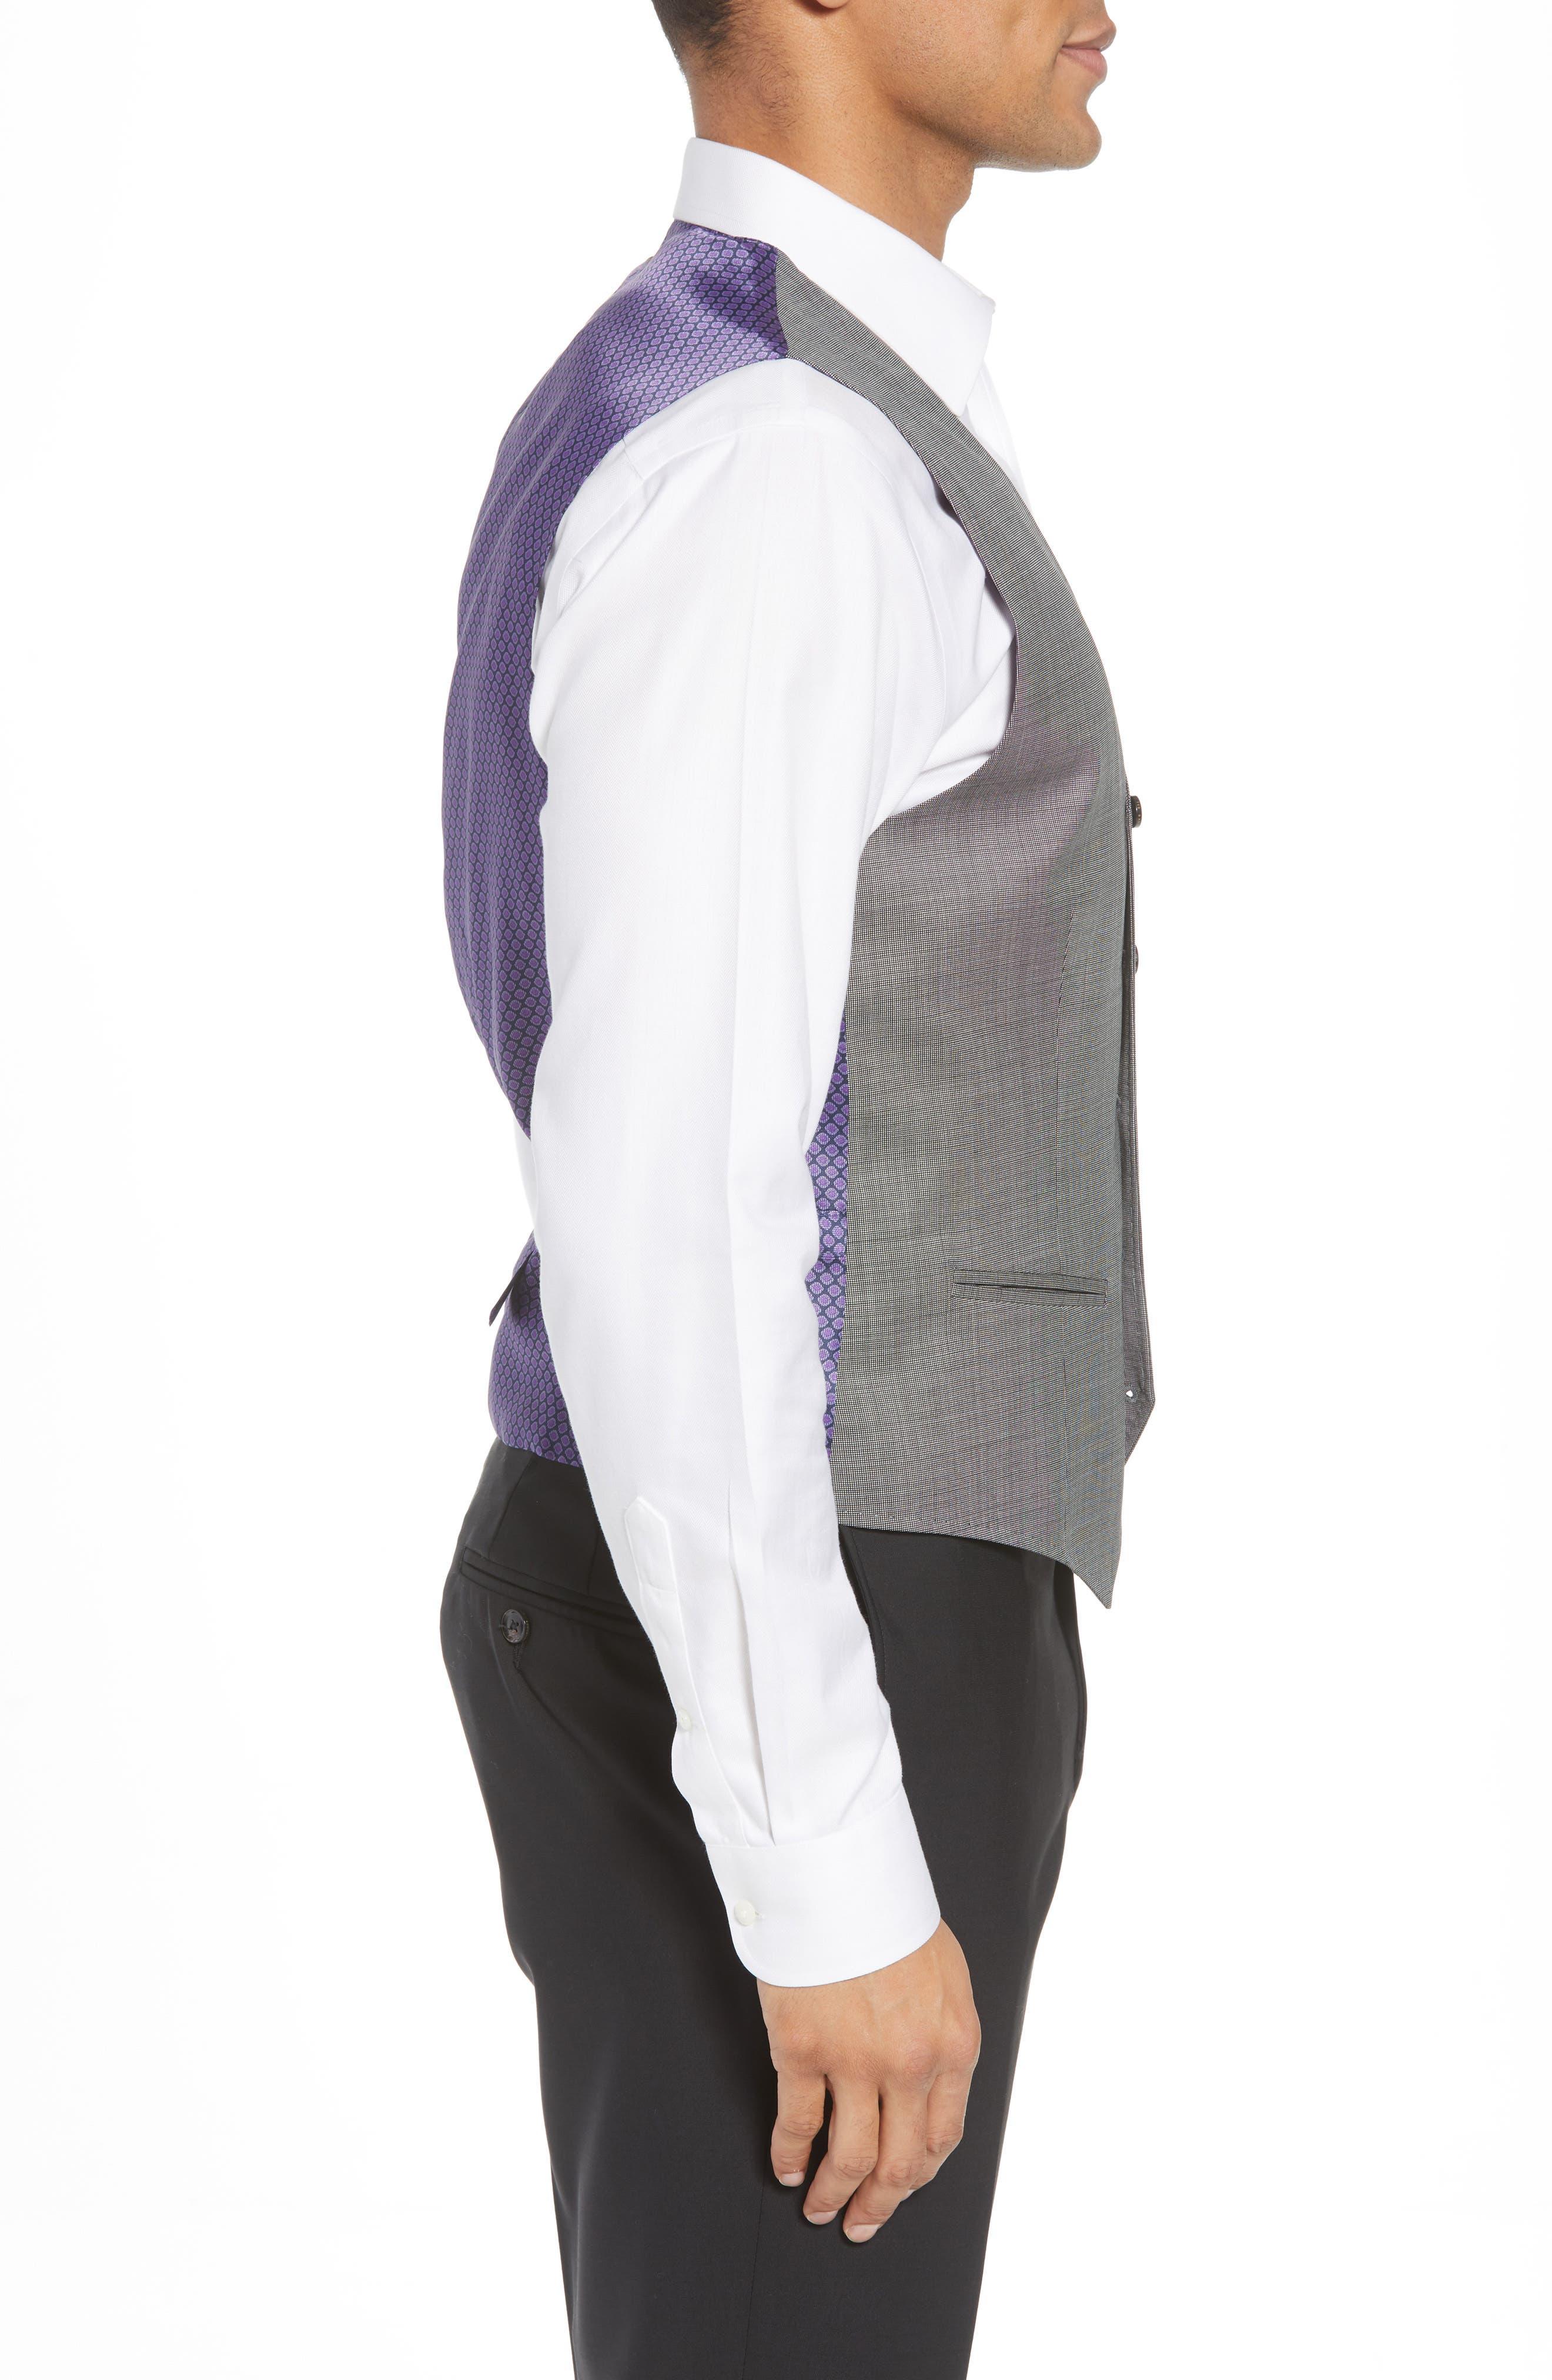 Troy Trim Fit Solid Wool Vest,                             Alternate thumbnail 3, color,                             LIGHT GREY